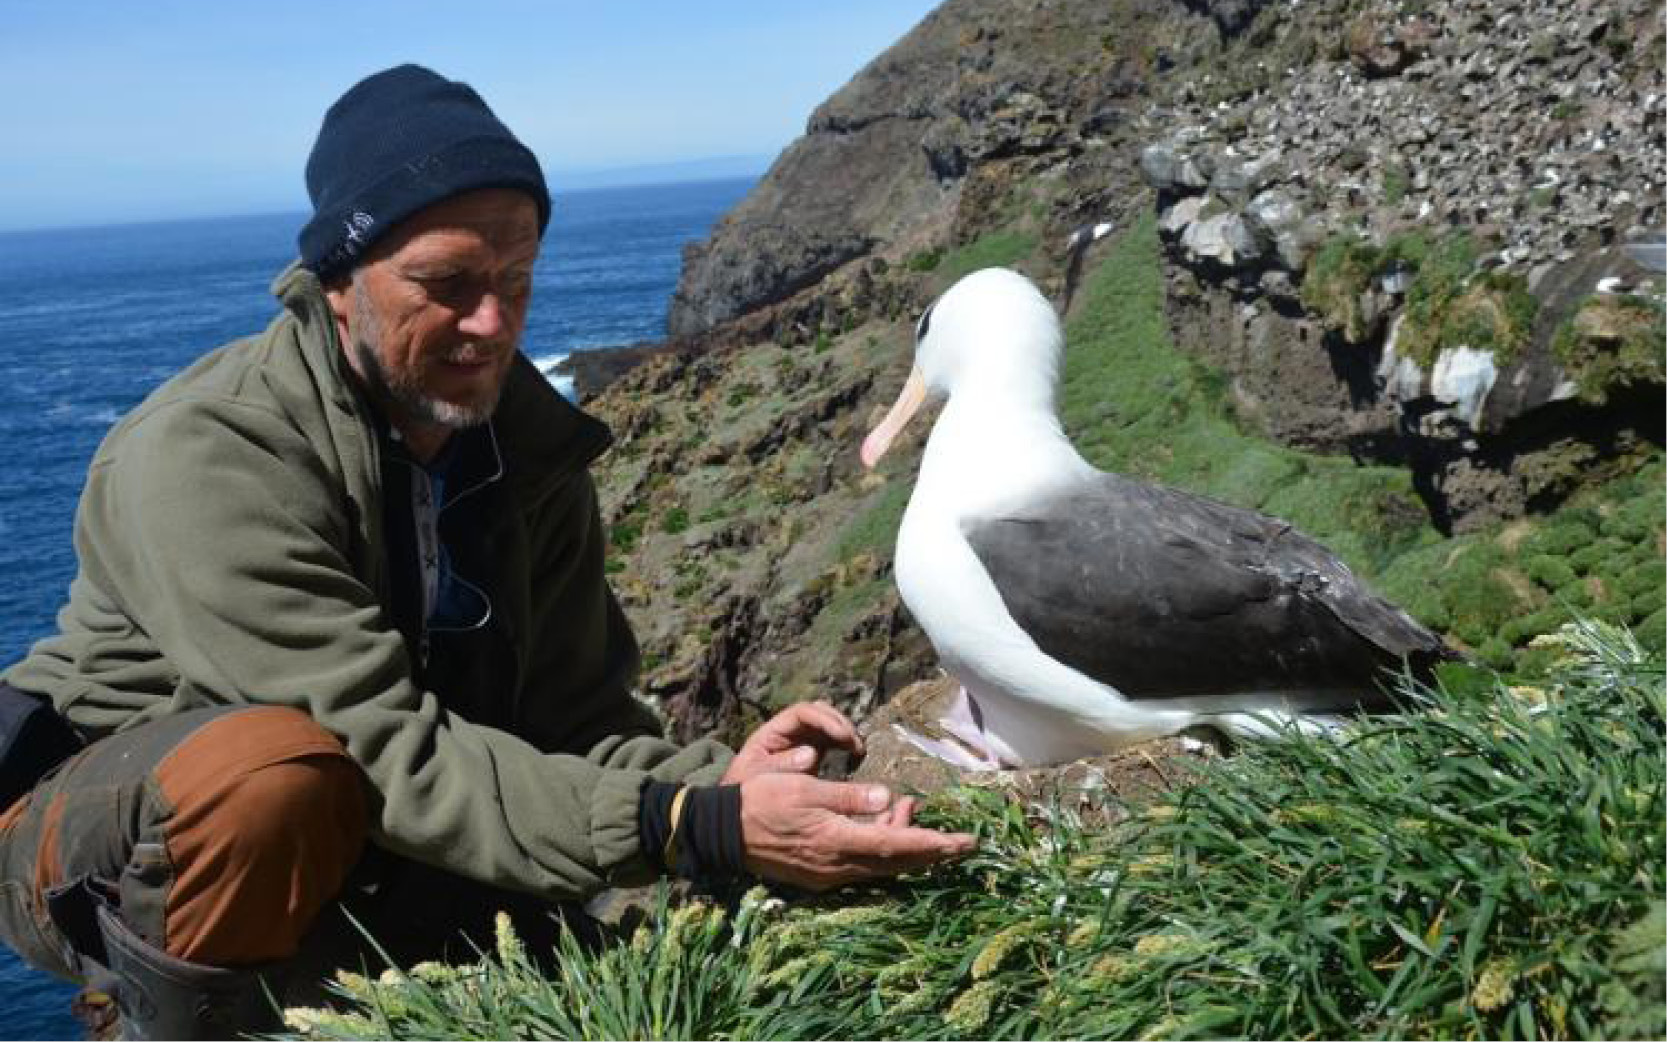 albatros argos tracking, argos PTT, albatros geolocation, wildlife geolocation